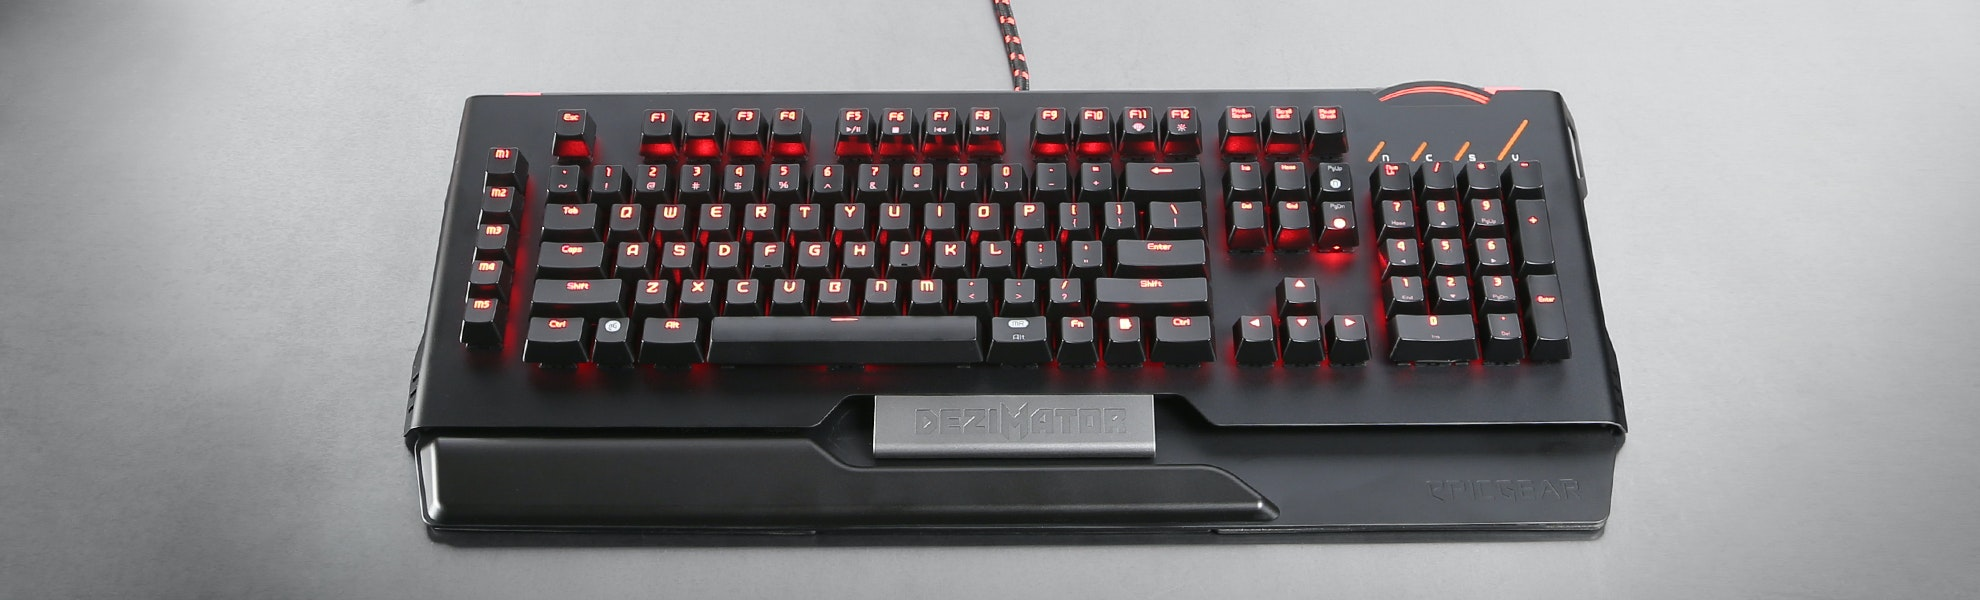 Dezimator X Gaming Mechanical Keyboard